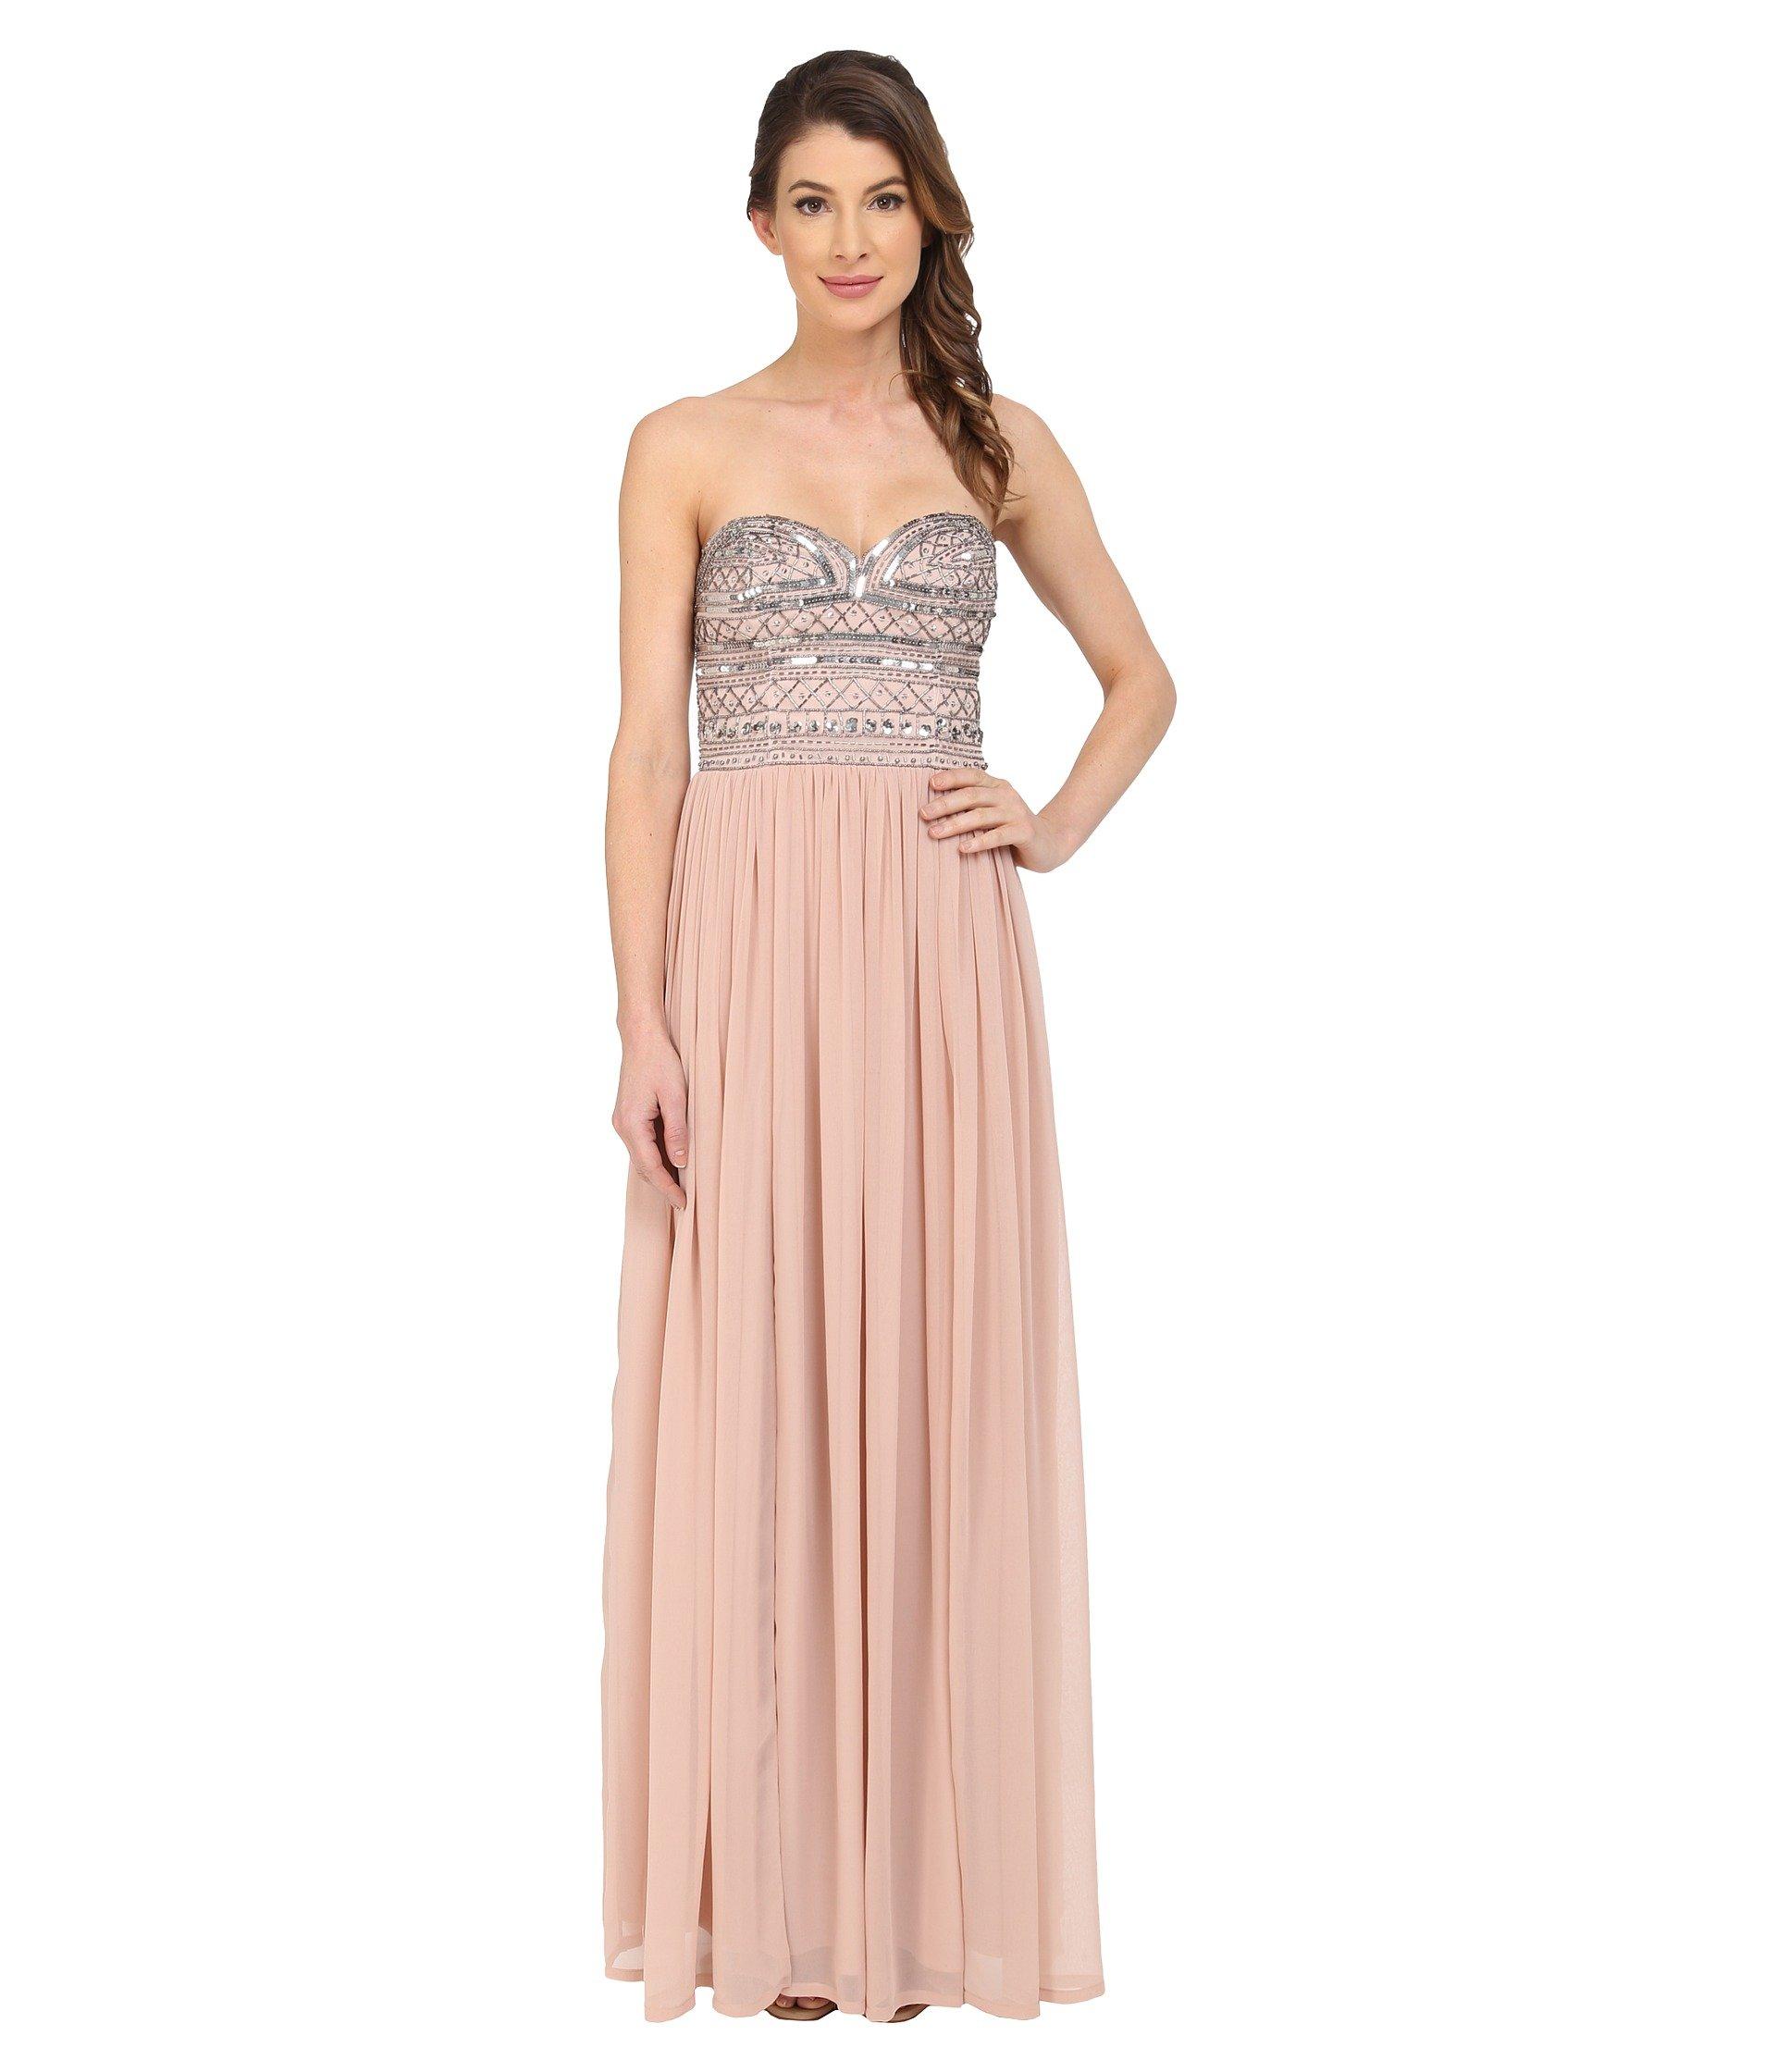 AIDAN MATTOX Strapless Chiffon Gown With Beaded Bodice, Blush | ModeSens